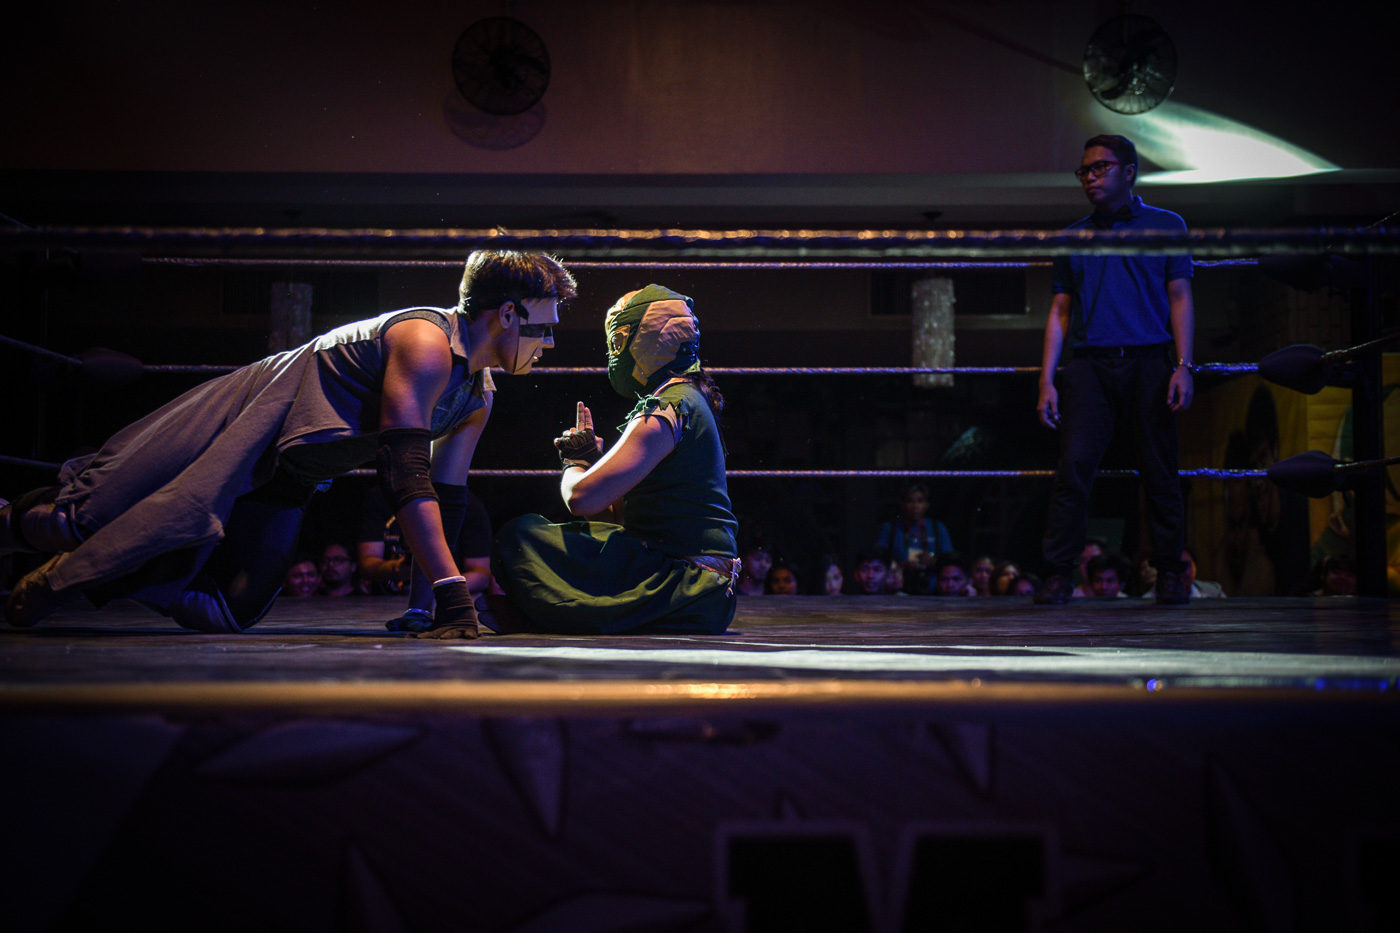 THE GLITCH. Morgan Vaughn approaches his opponent Ninja Ryujin at MWF 2: Maki-Wrestling, 'Wag Matakot at the UP Bahay ng Alumni on May 27, 2018. Photo by LeAnne Jazul/Rappler